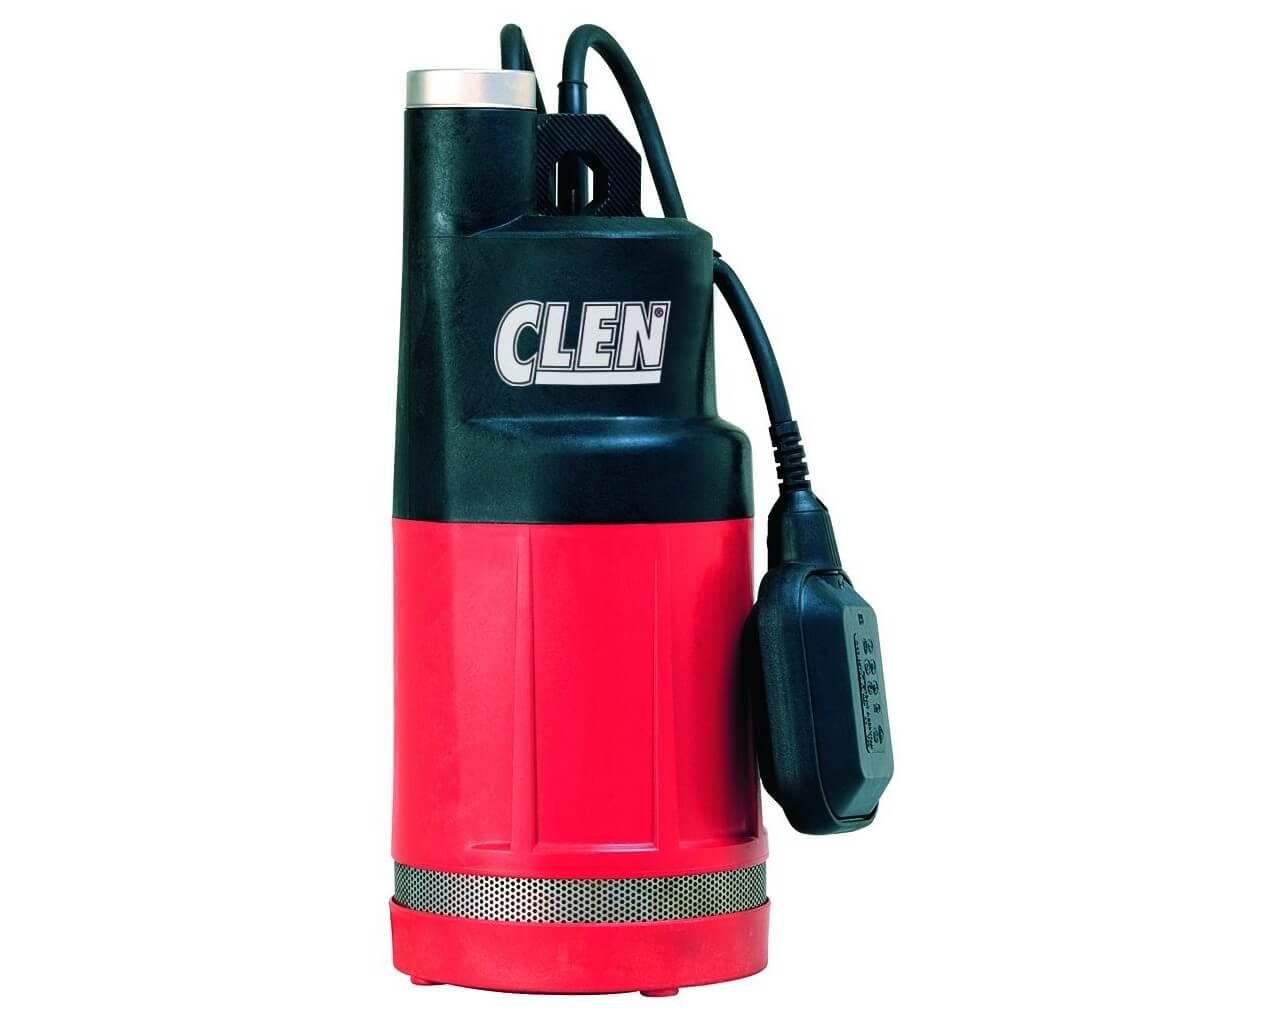 CLEN ECODIVER 750A - Kailatec Oy Verkkokauppa